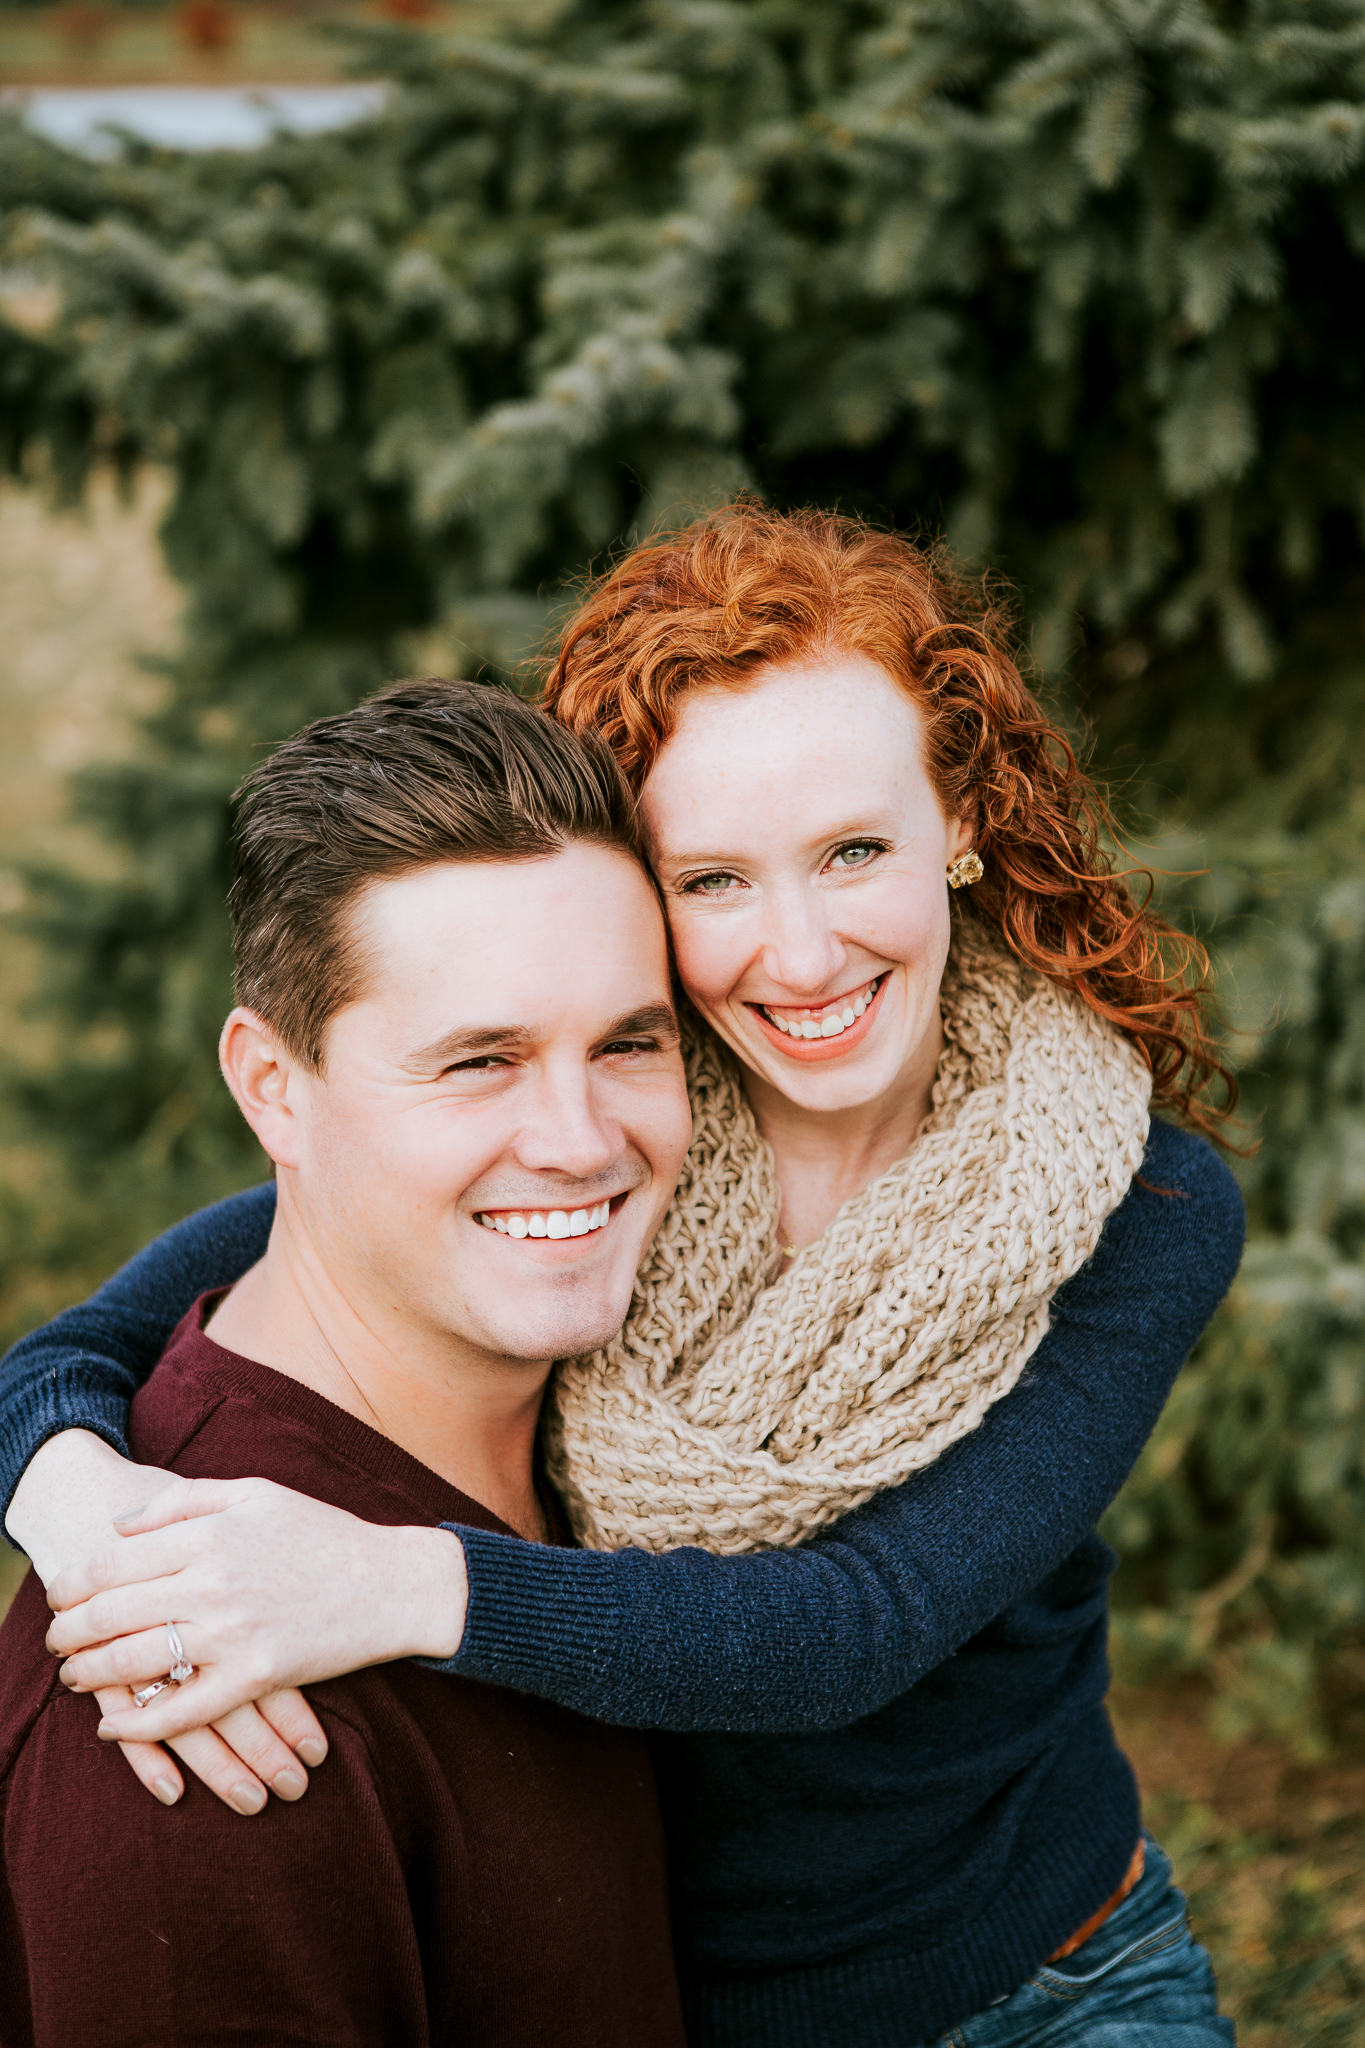 Richmond Kentucky Engagement Photographer - Ariana Jordan Photography -35.jpg